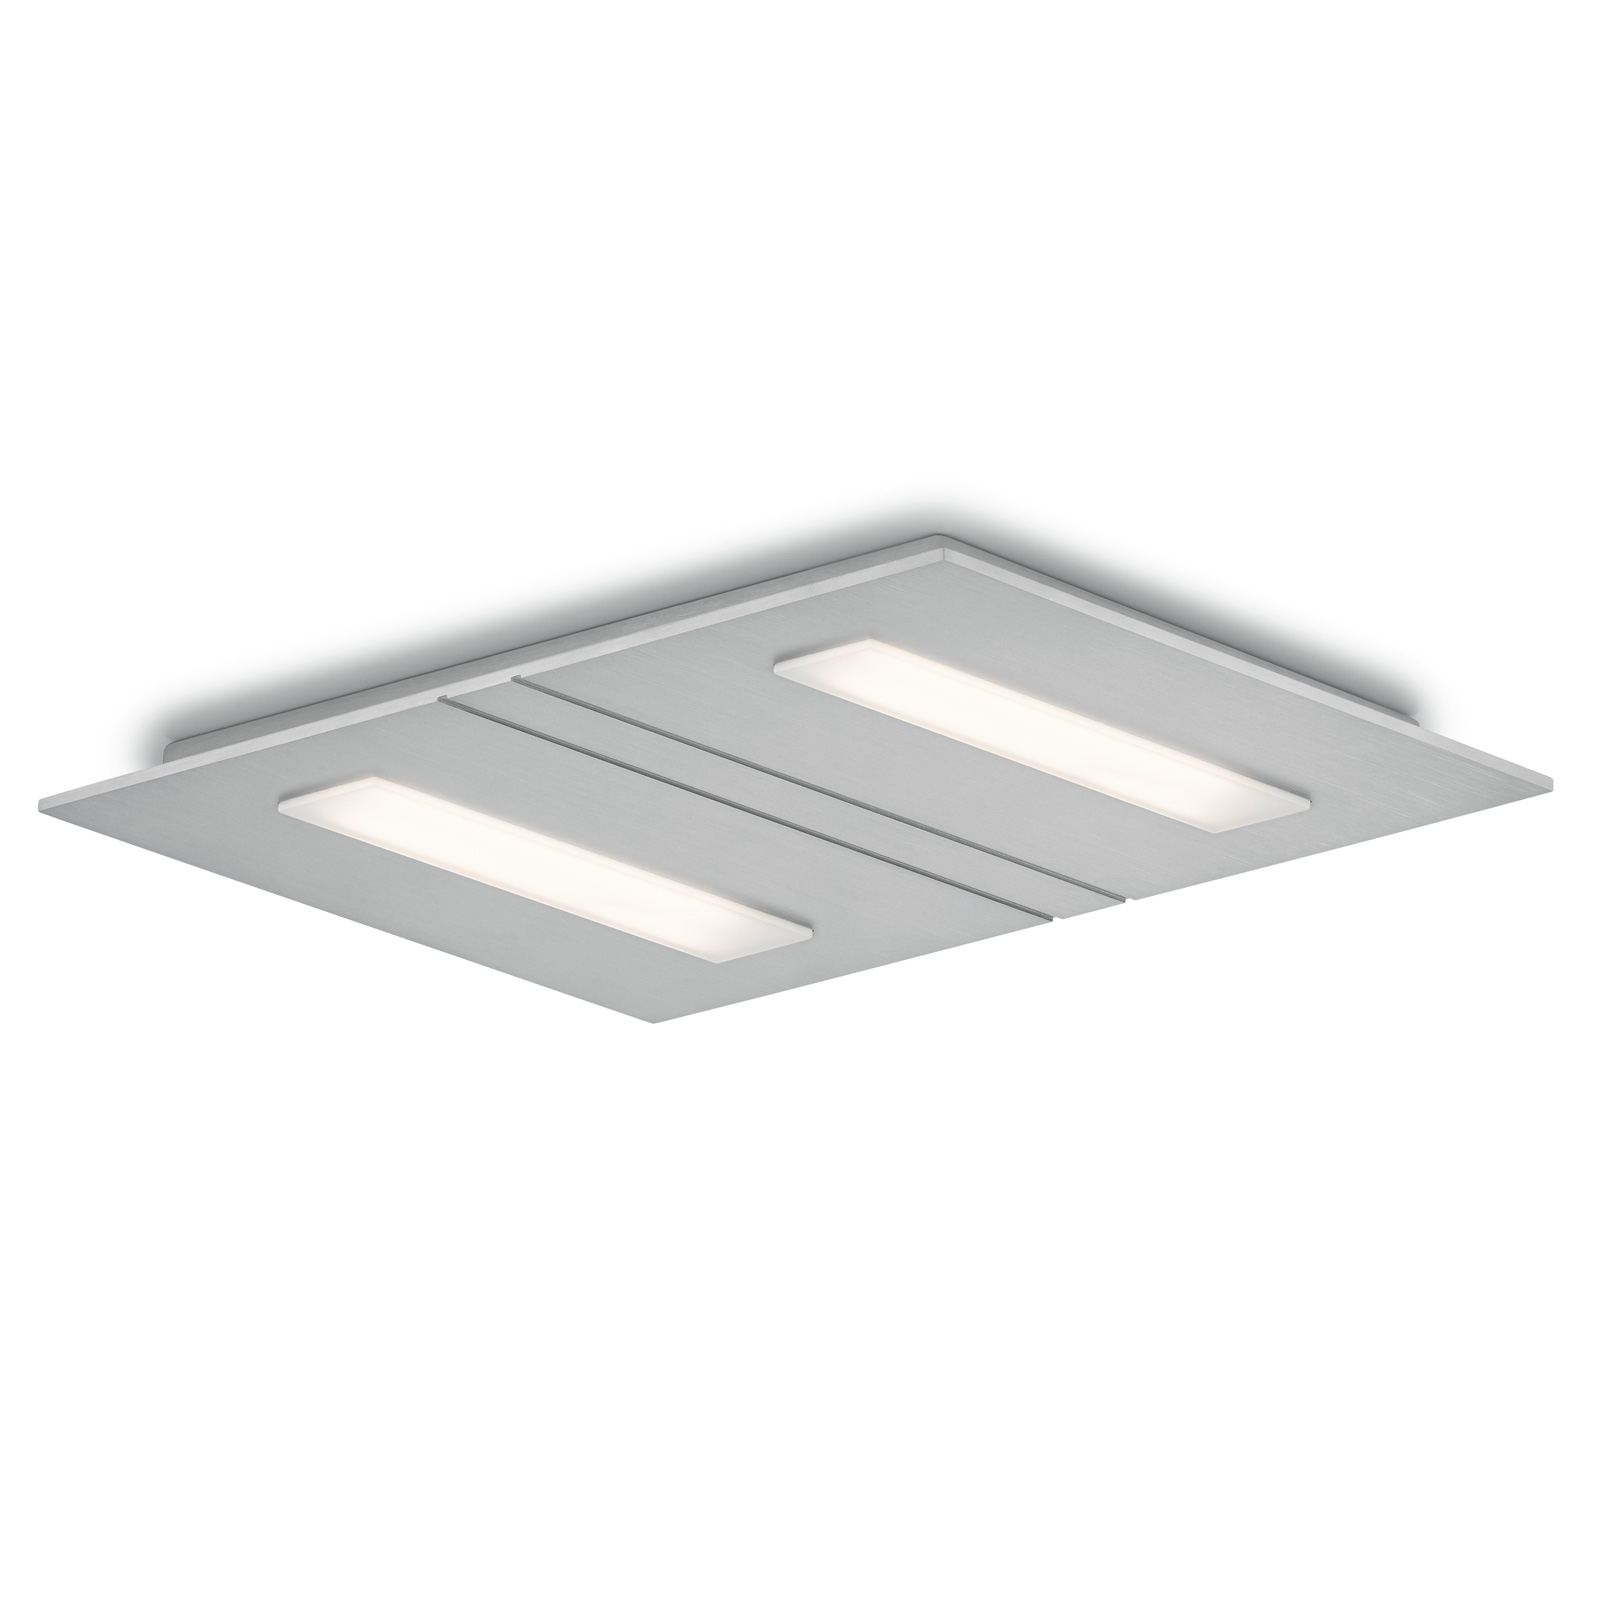 LED-taklampe Sina-2, dim-til-varm, 2 lyskilder